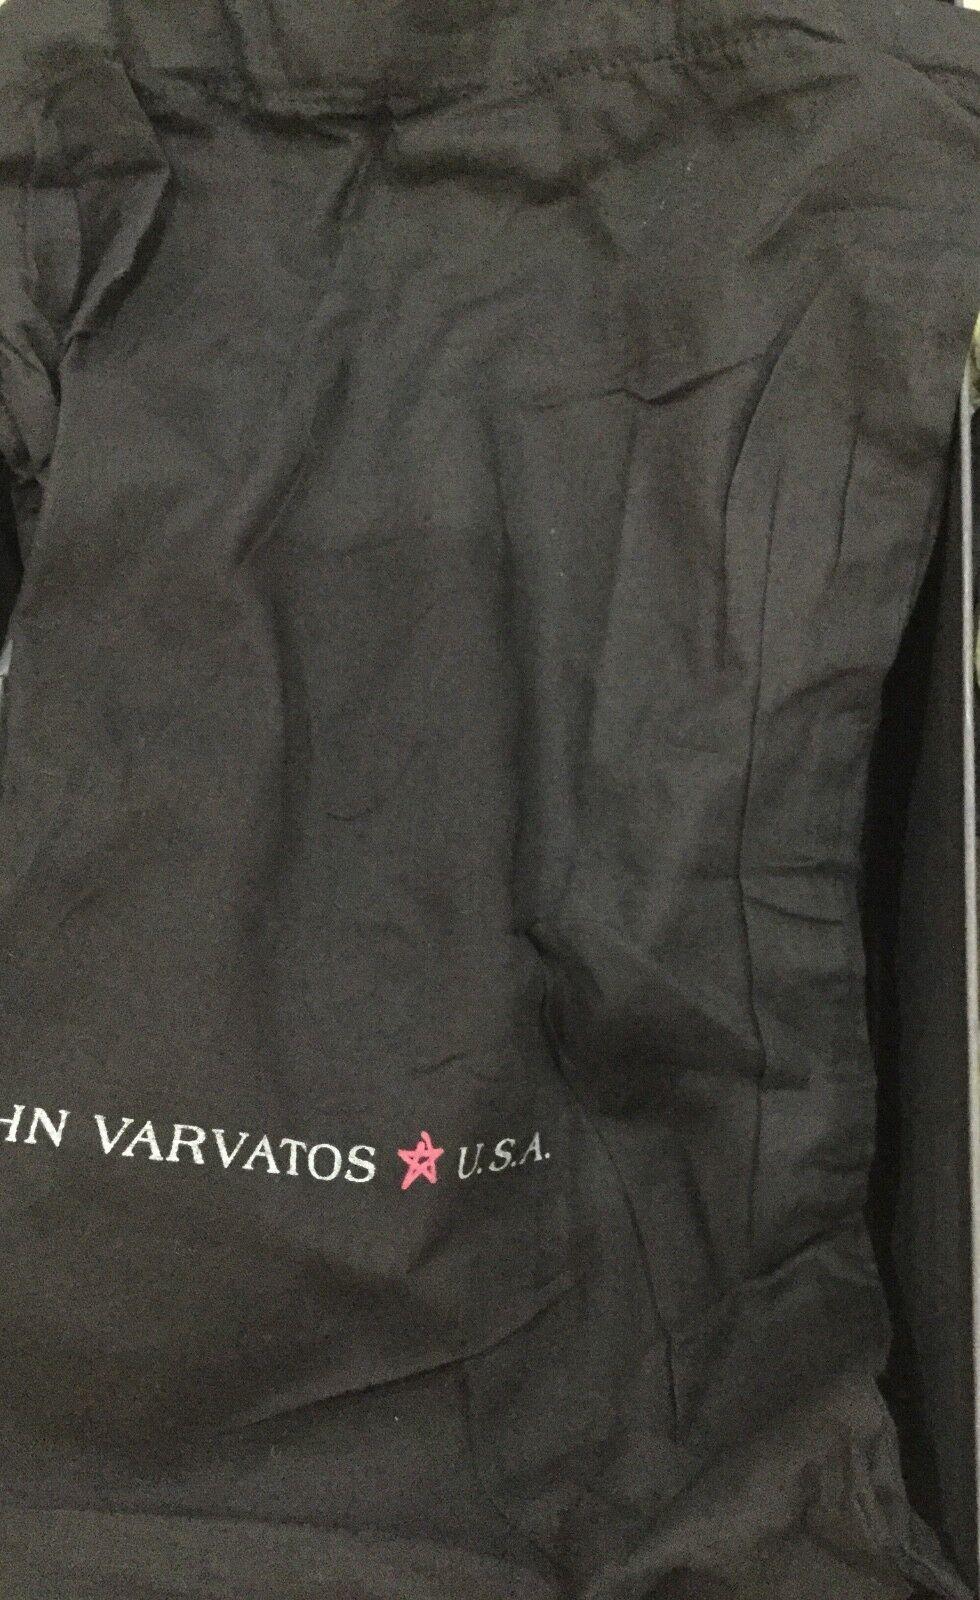 John Varvatos USA schwarz suede Hattan Hattan Hattan fashion Turnschuhe NIB 9.50  RARE 9abf43